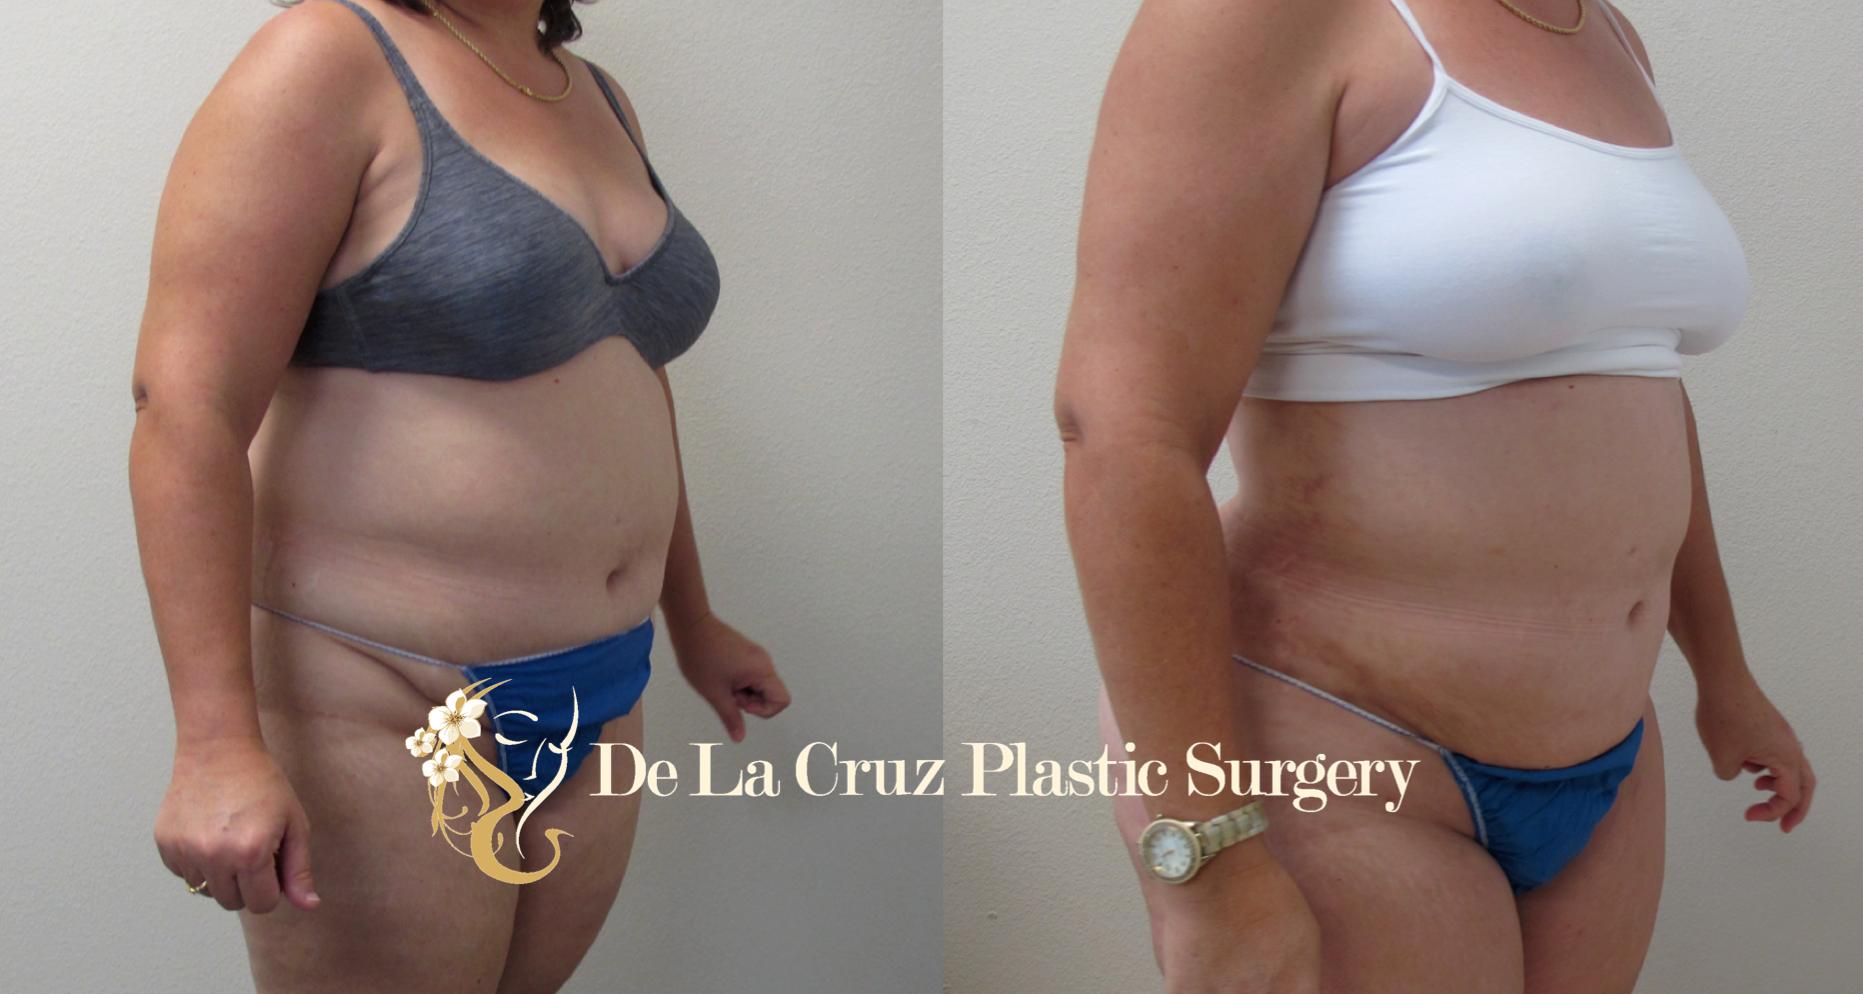 VASER Liposuction (Before and After 6 months of Surgery) performed by Dr. Emmanuel De La Cruz